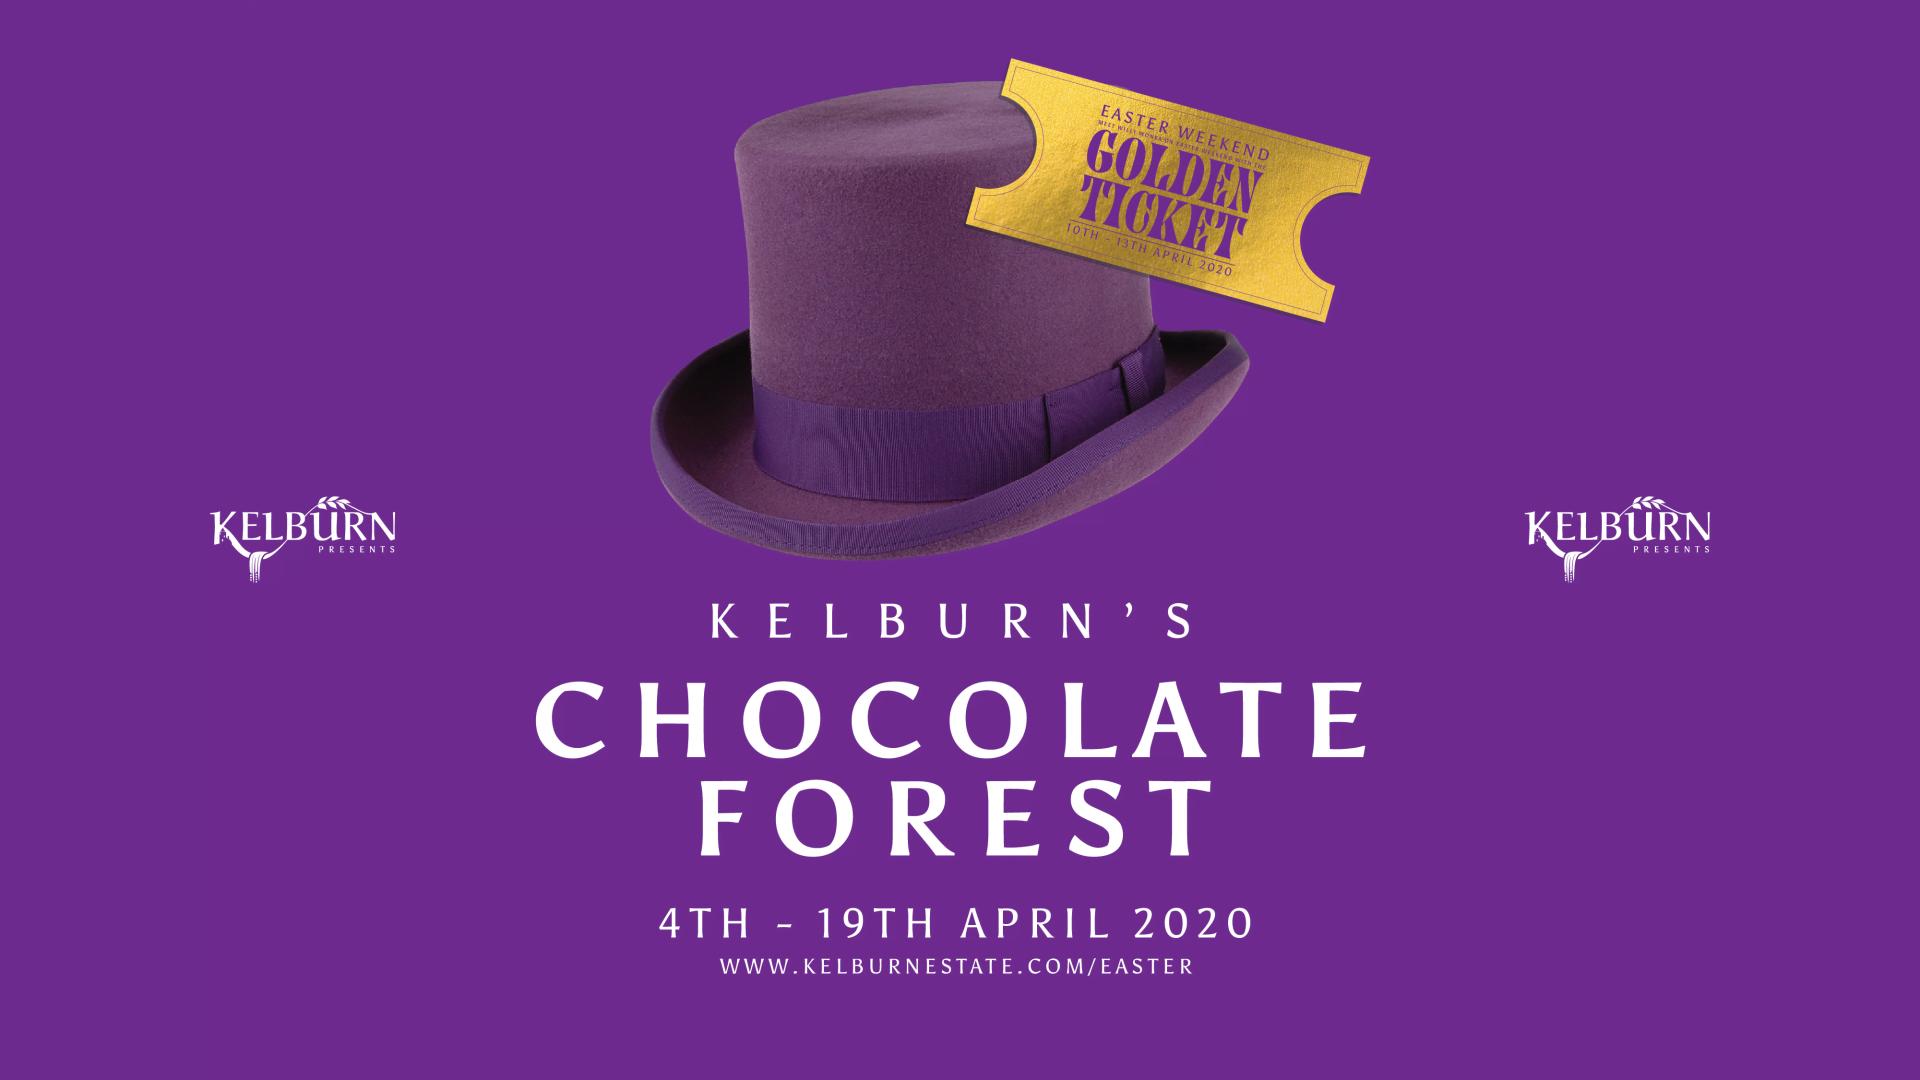 Kelburn's Chocolate Forest